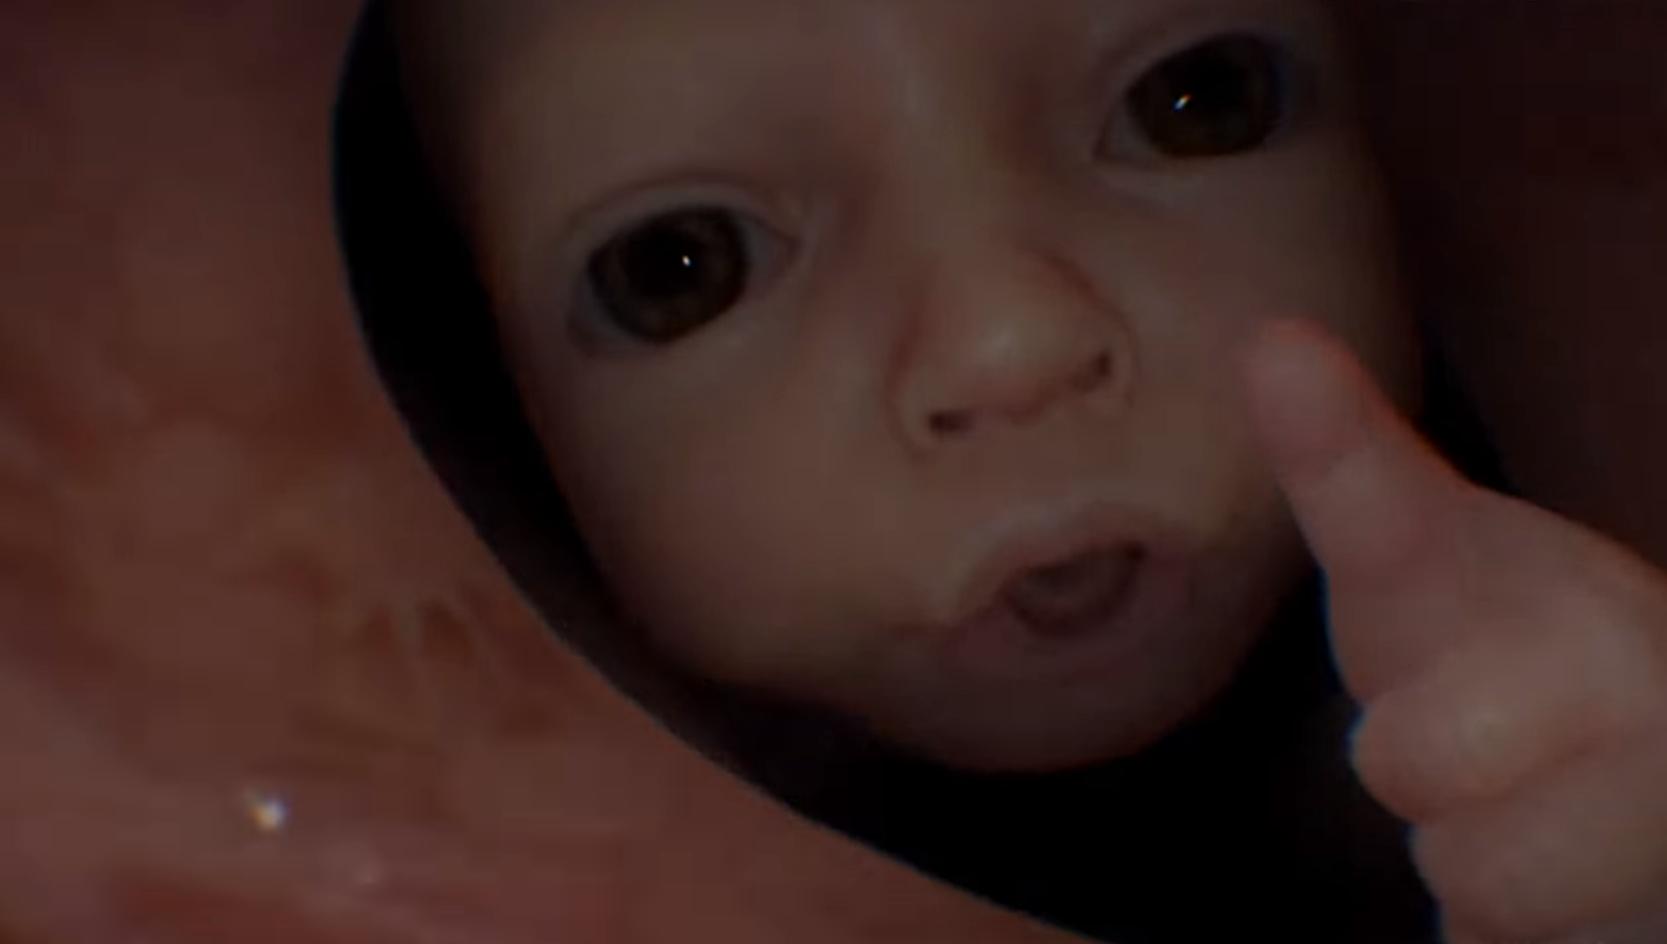 whats deal death strandings throat babies vg